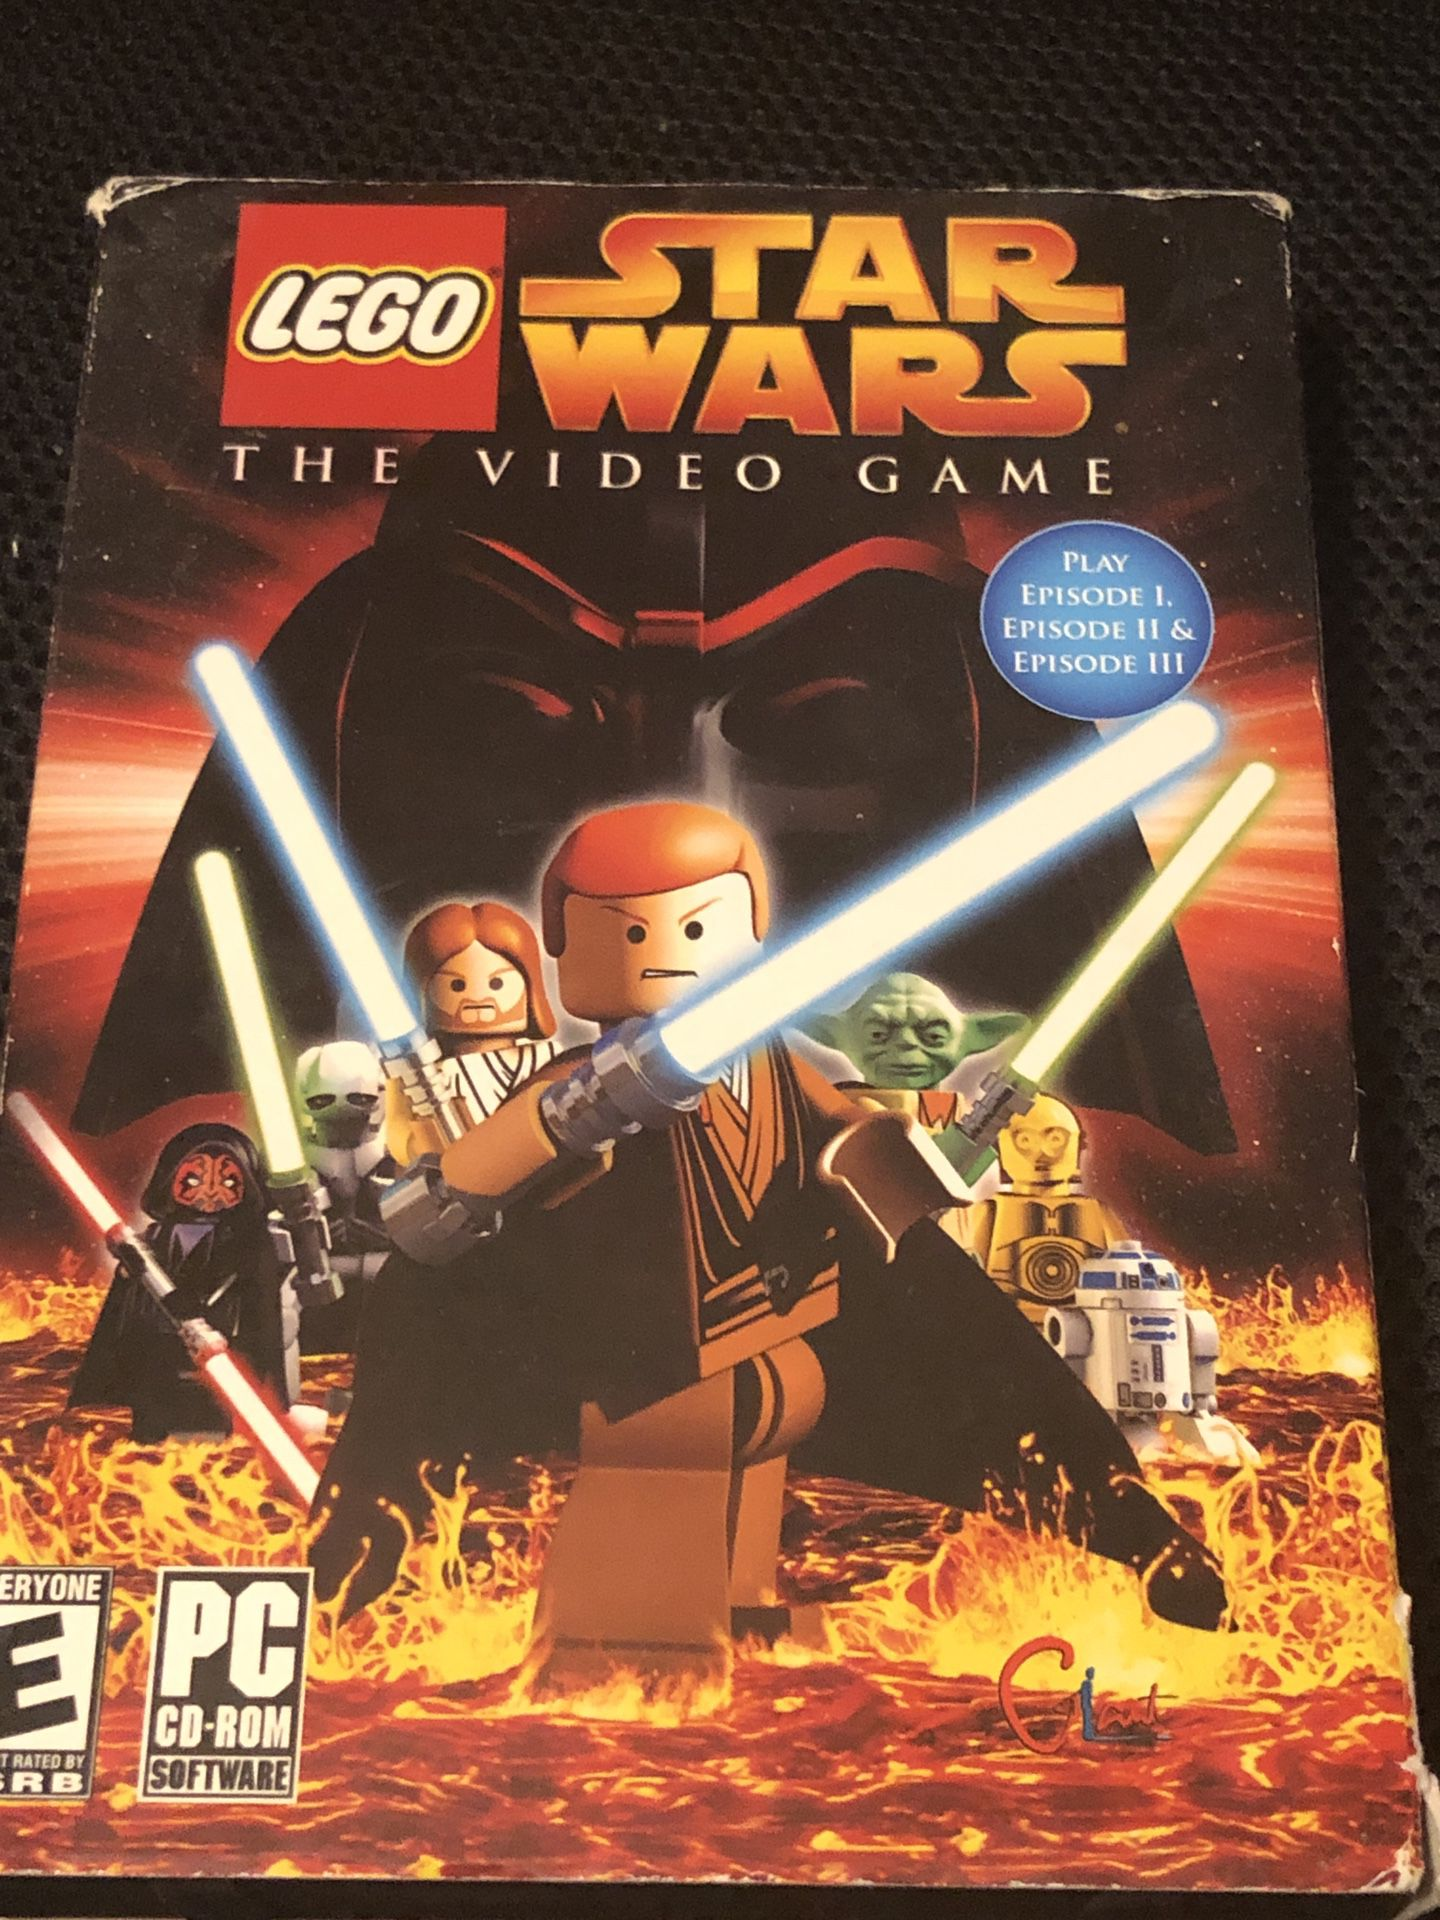 PC Windows DVD games, Star Wars, Lego, NBA